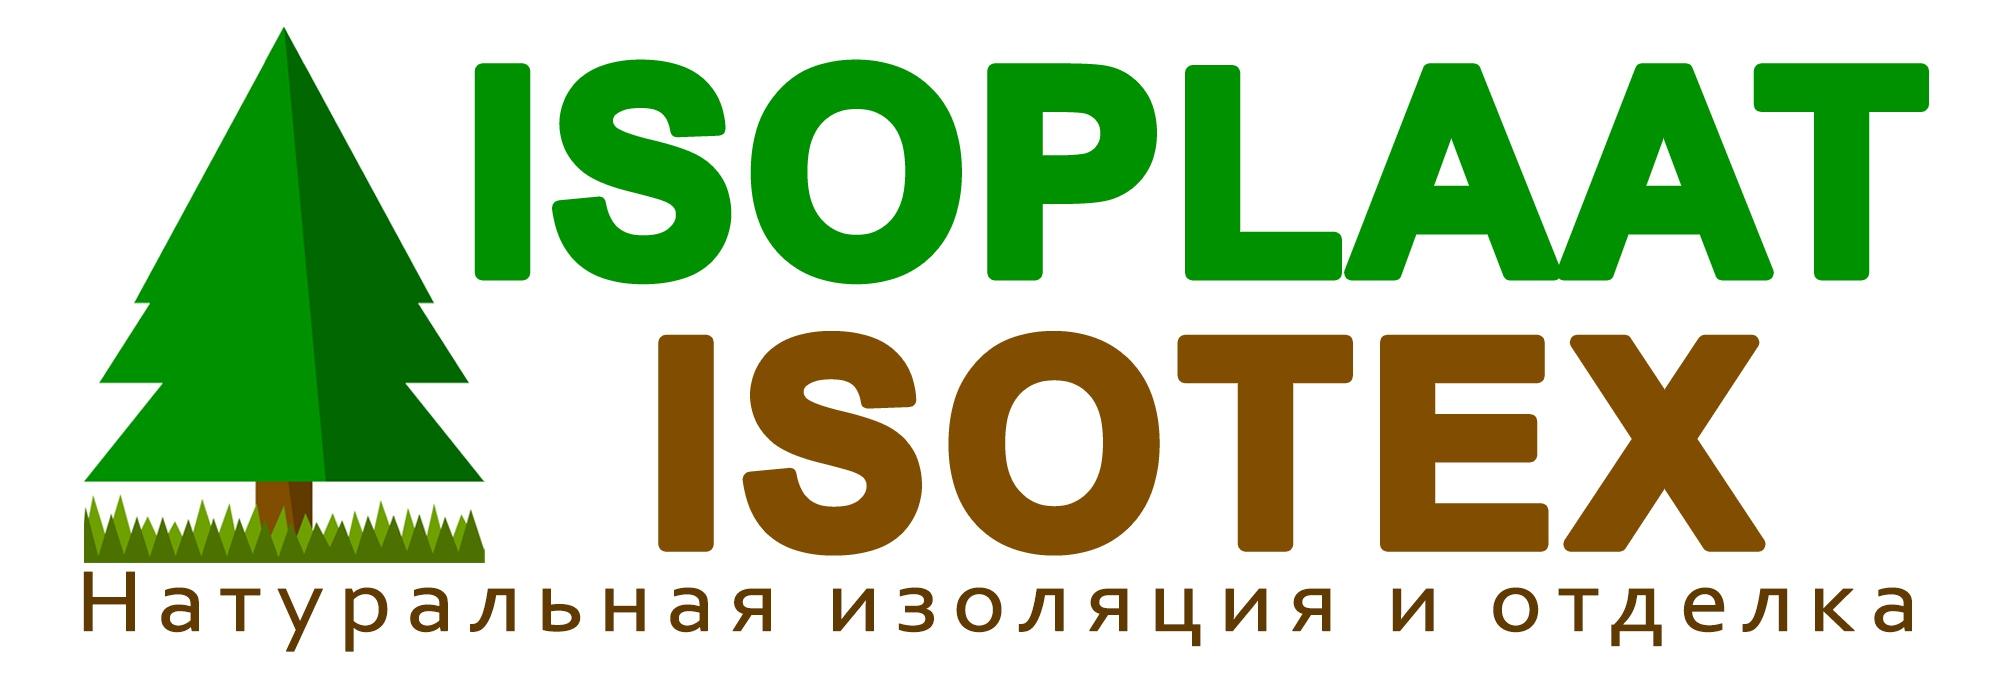 ekoplat